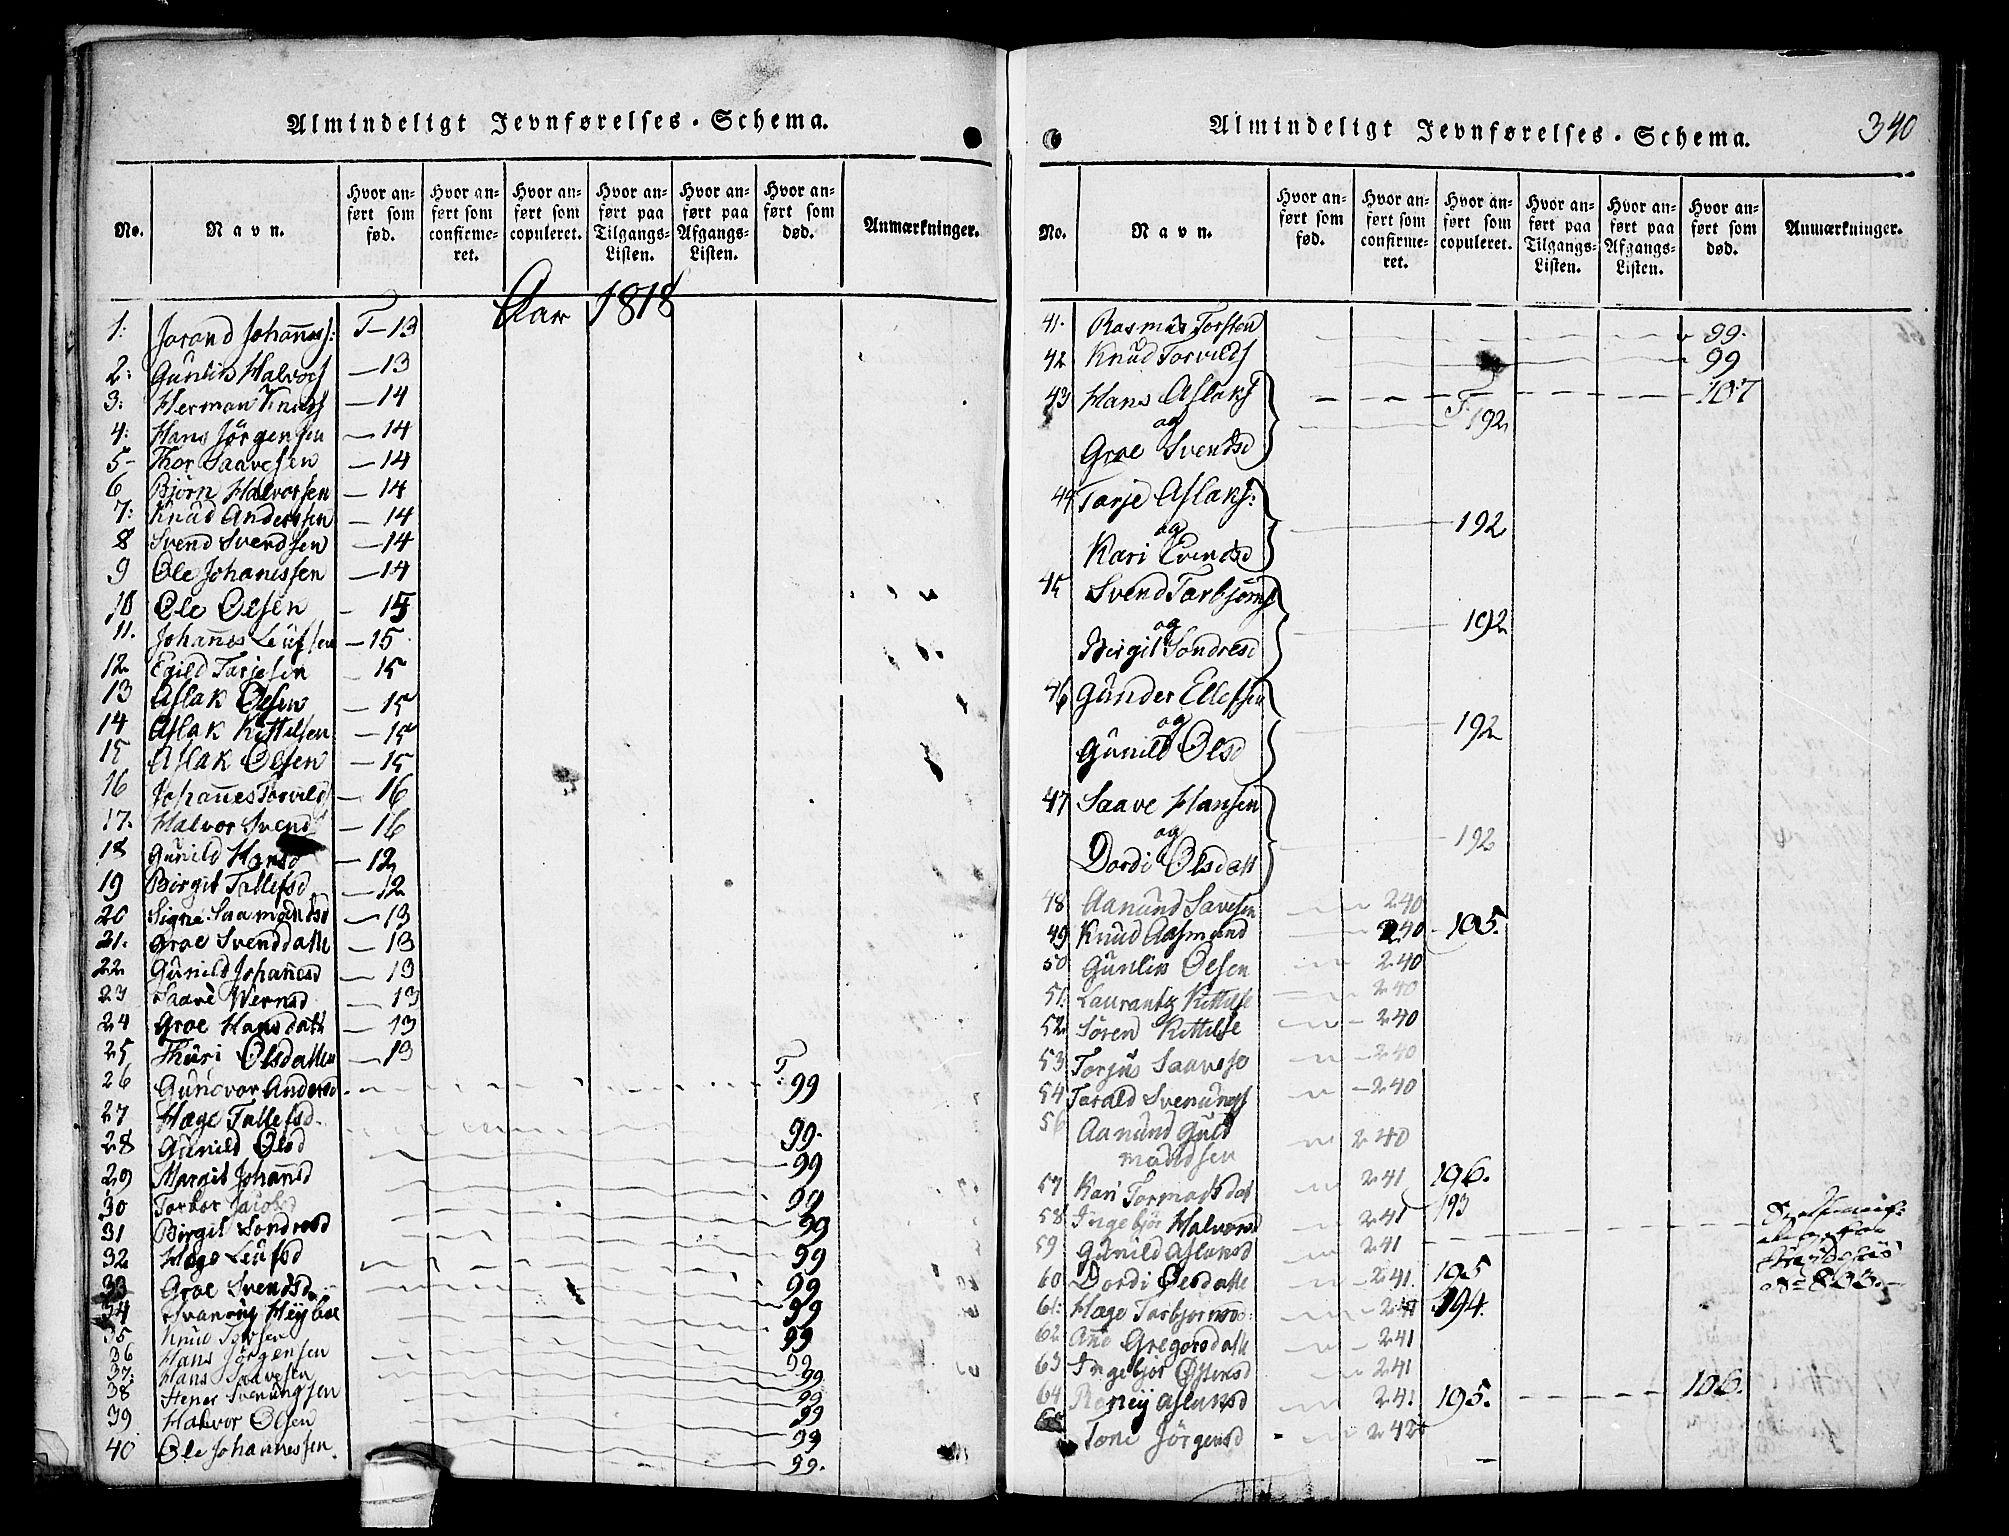 SAKO, Kviteseid kirkebøker, F/Fb/L0001: Ministerialbok nr. II 1, 1815-1836, s. 340